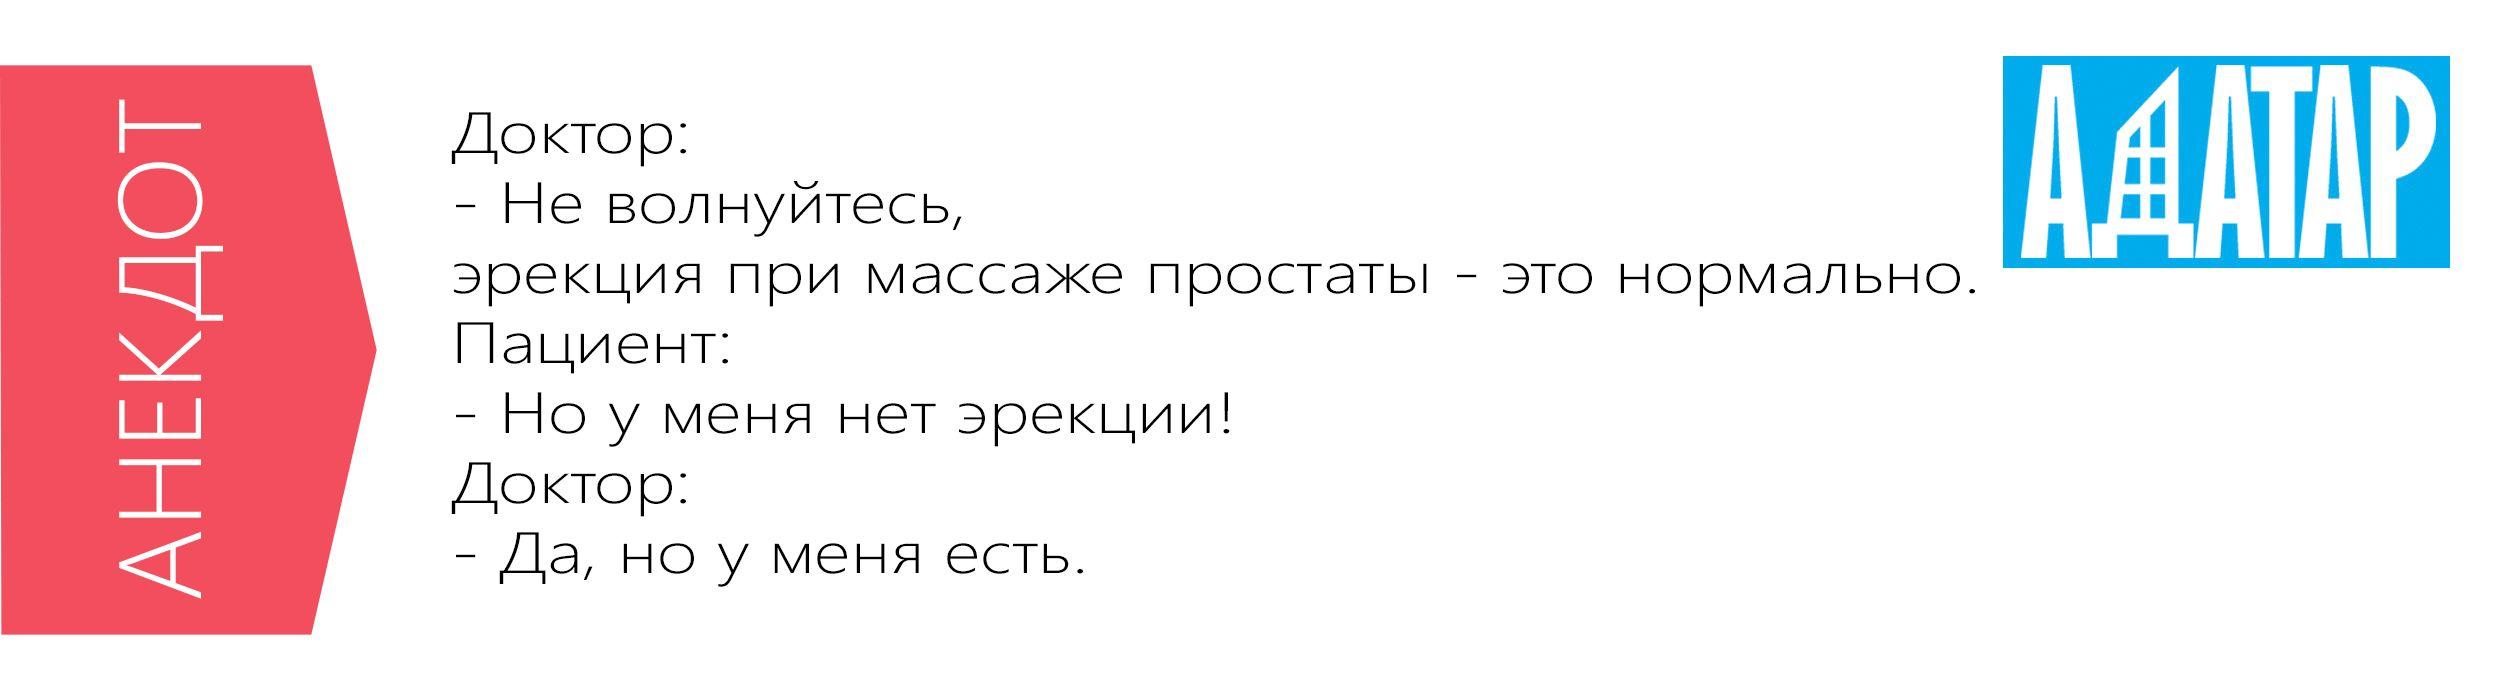 АНЕКДОТ 58.jpg